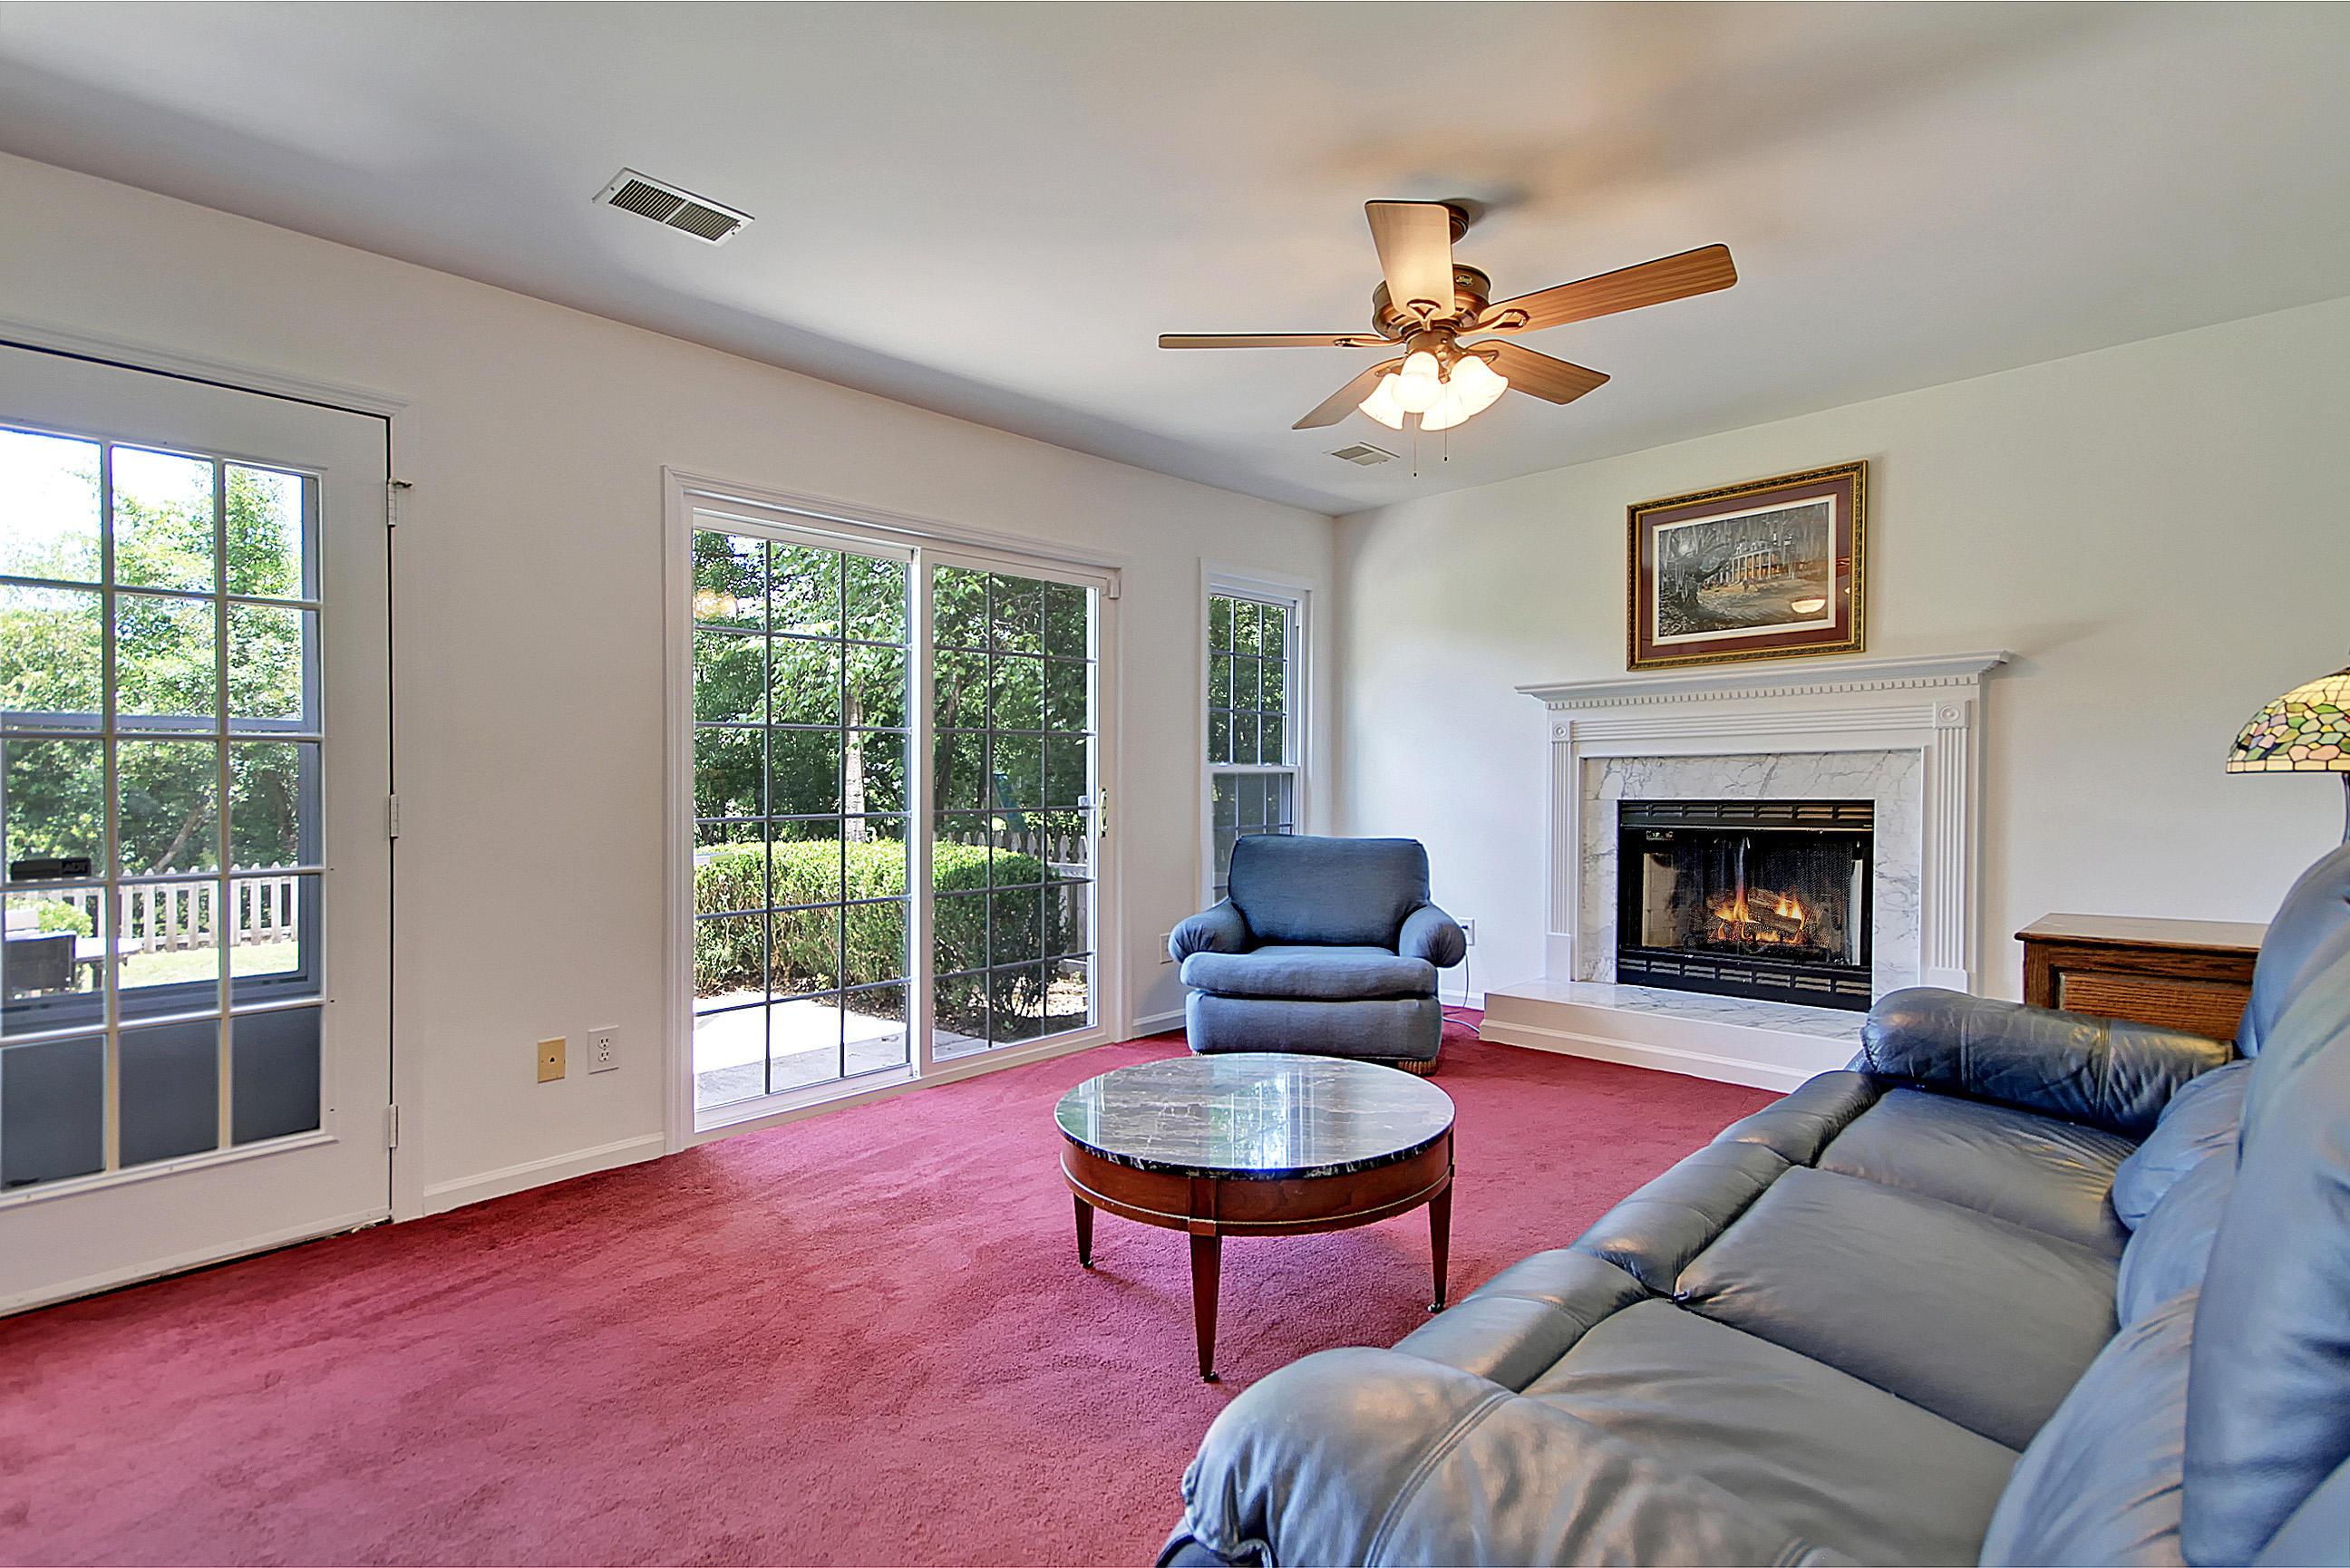 Center Lake Homes For Sale - 1252 Center Lake, Mount Pleasant, SC - 6